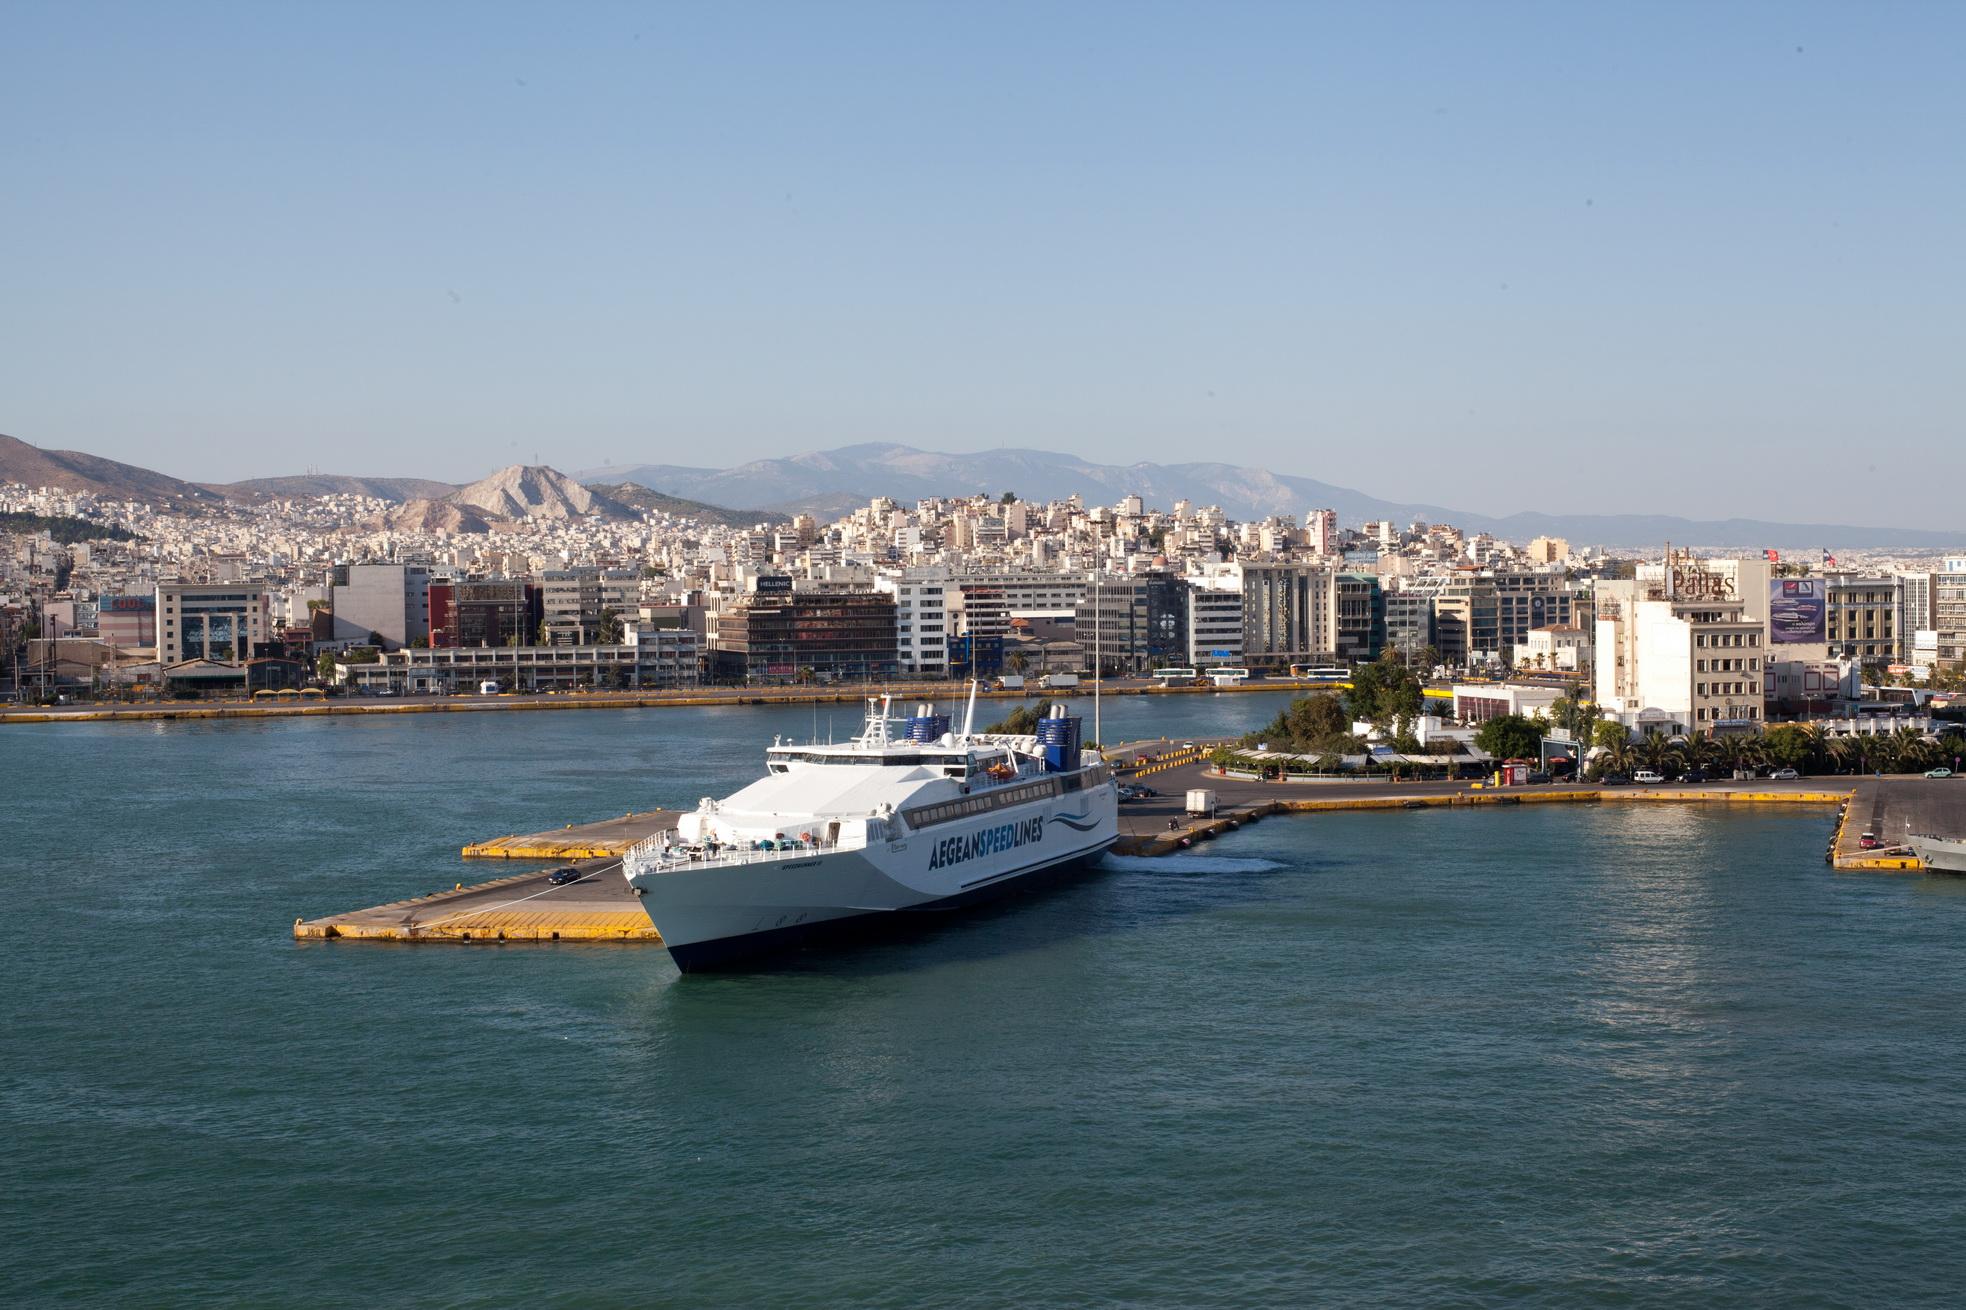 MS Speedrunner III IMO 9141871 Aegean Speed Lines docking Piraeus Port of Athens Greece 02